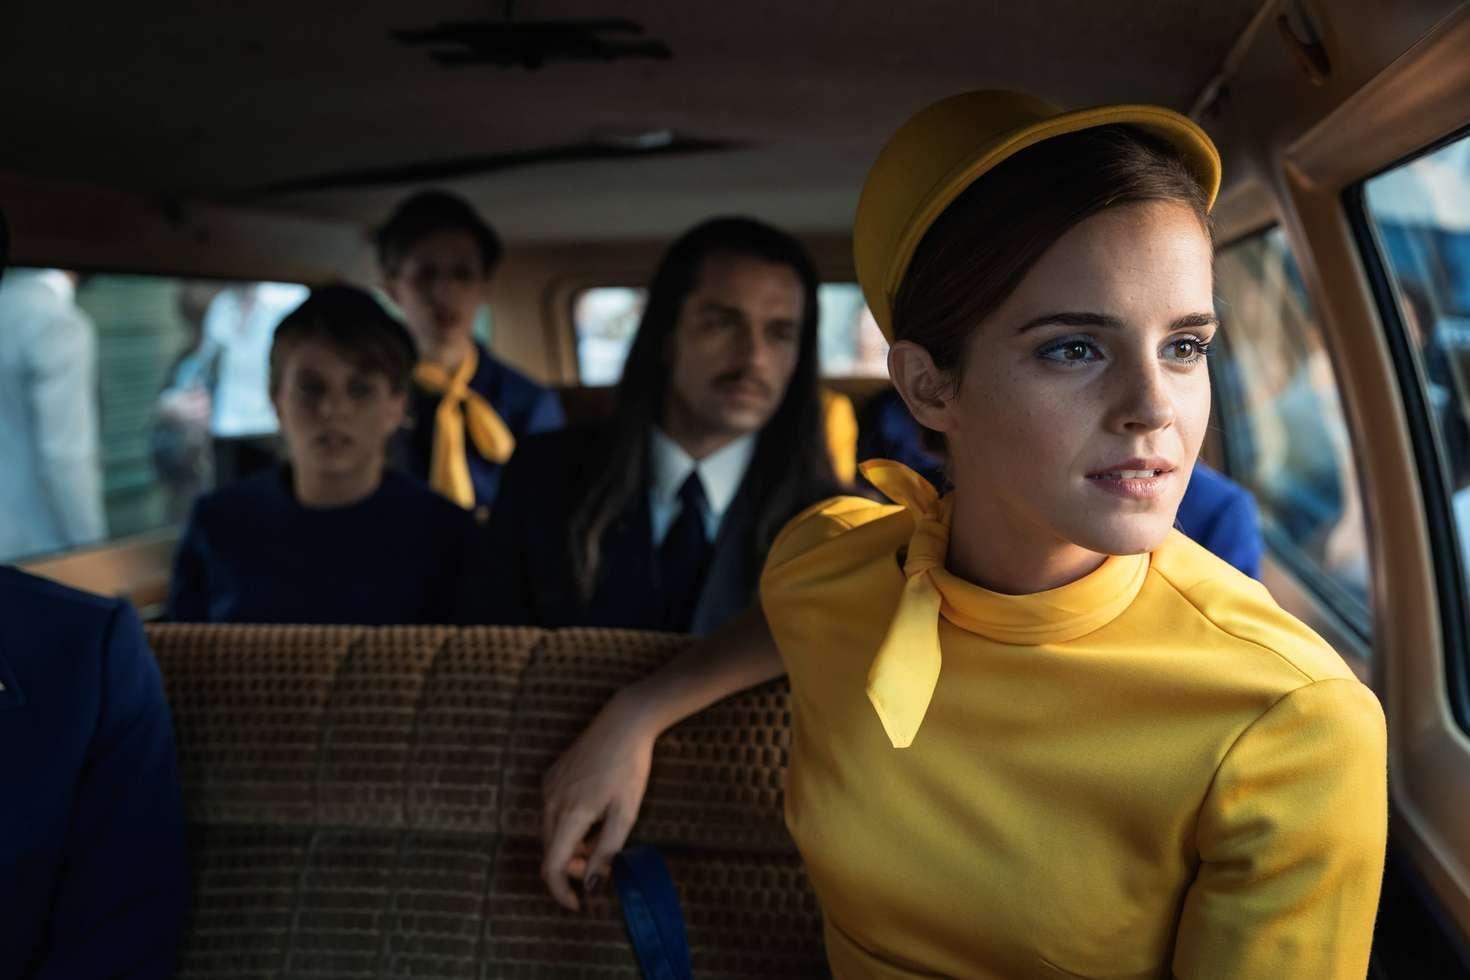 Potterish.com [Year 18] :: Harry Potter, The Ickabog, Fantastic Beasts, JK Rowling, Daniel, Emma & Rupert Emma Watson's Post-Potter Career